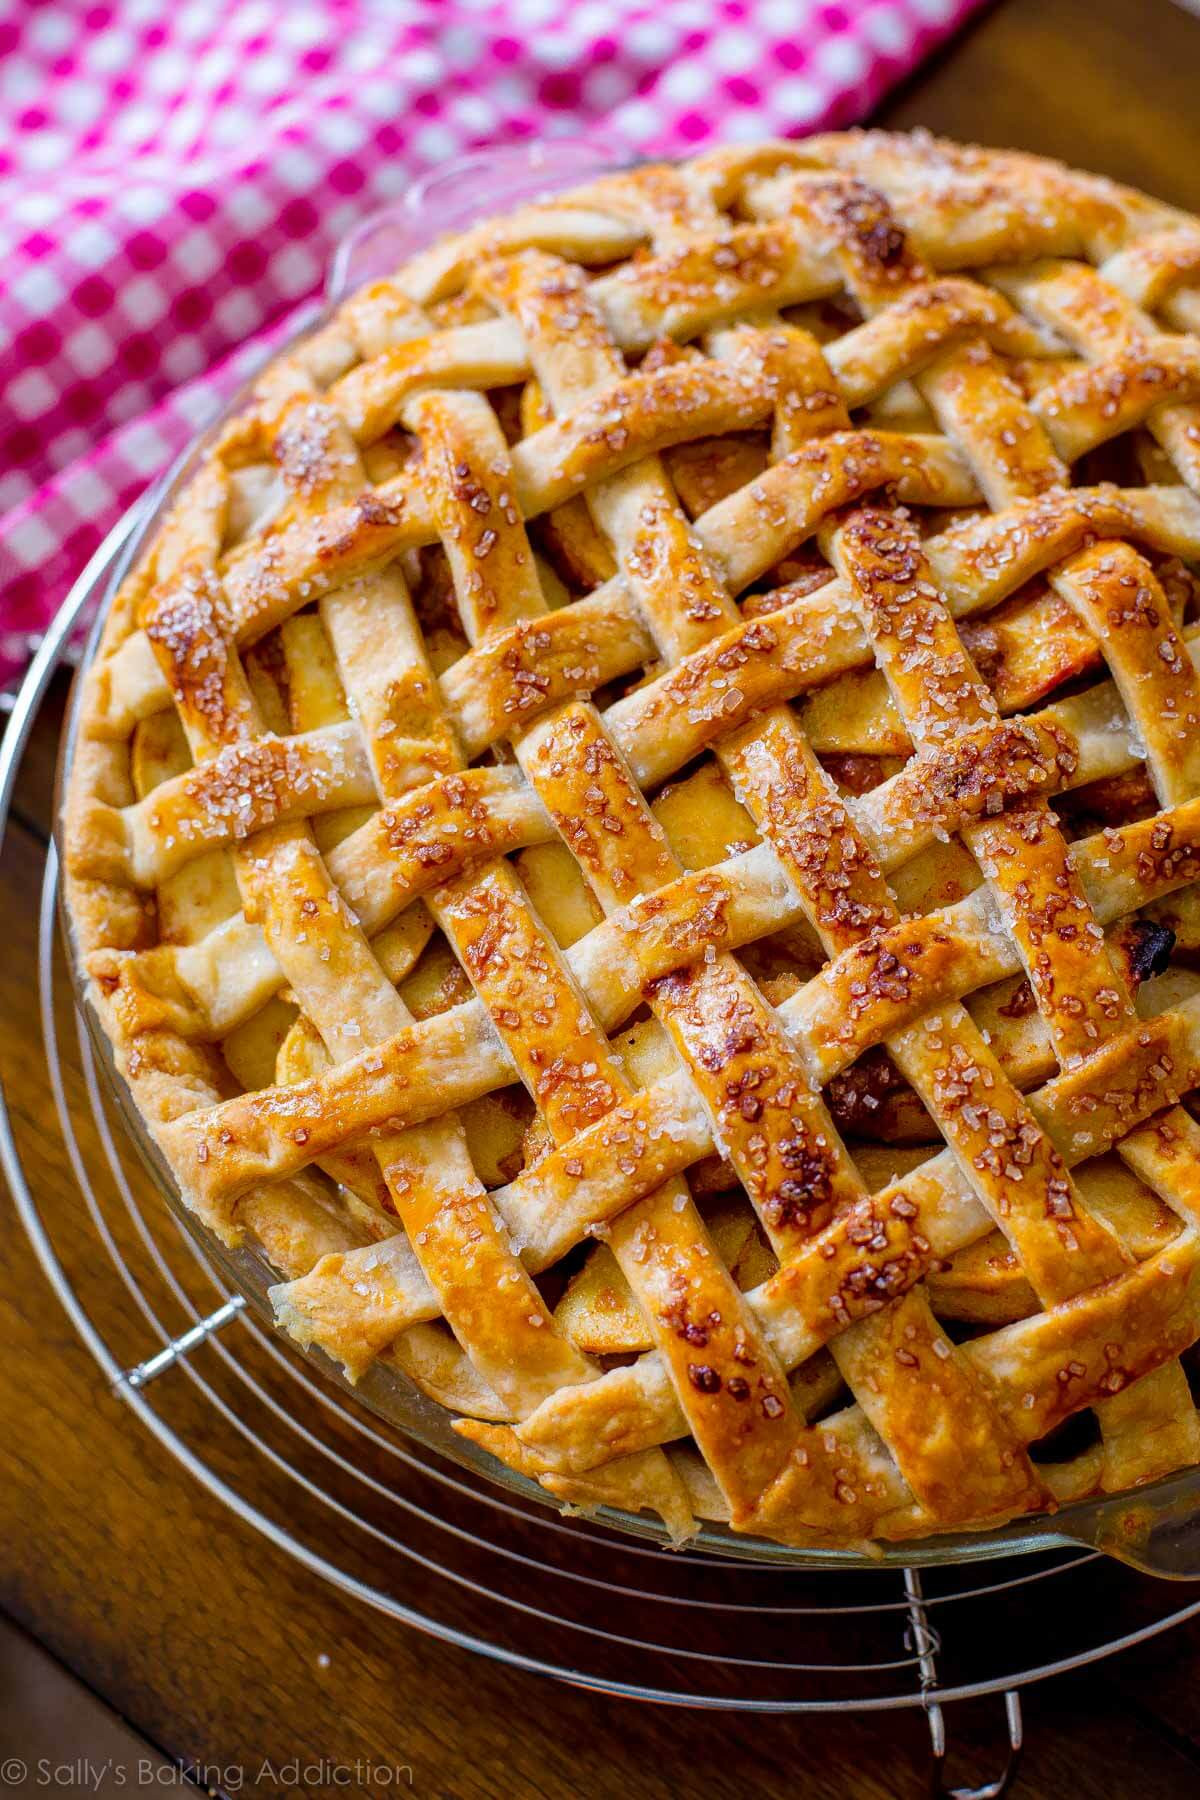 Recipes For Apple Pie  Salted Caramel Apple Pie Sallys Baking Addiction